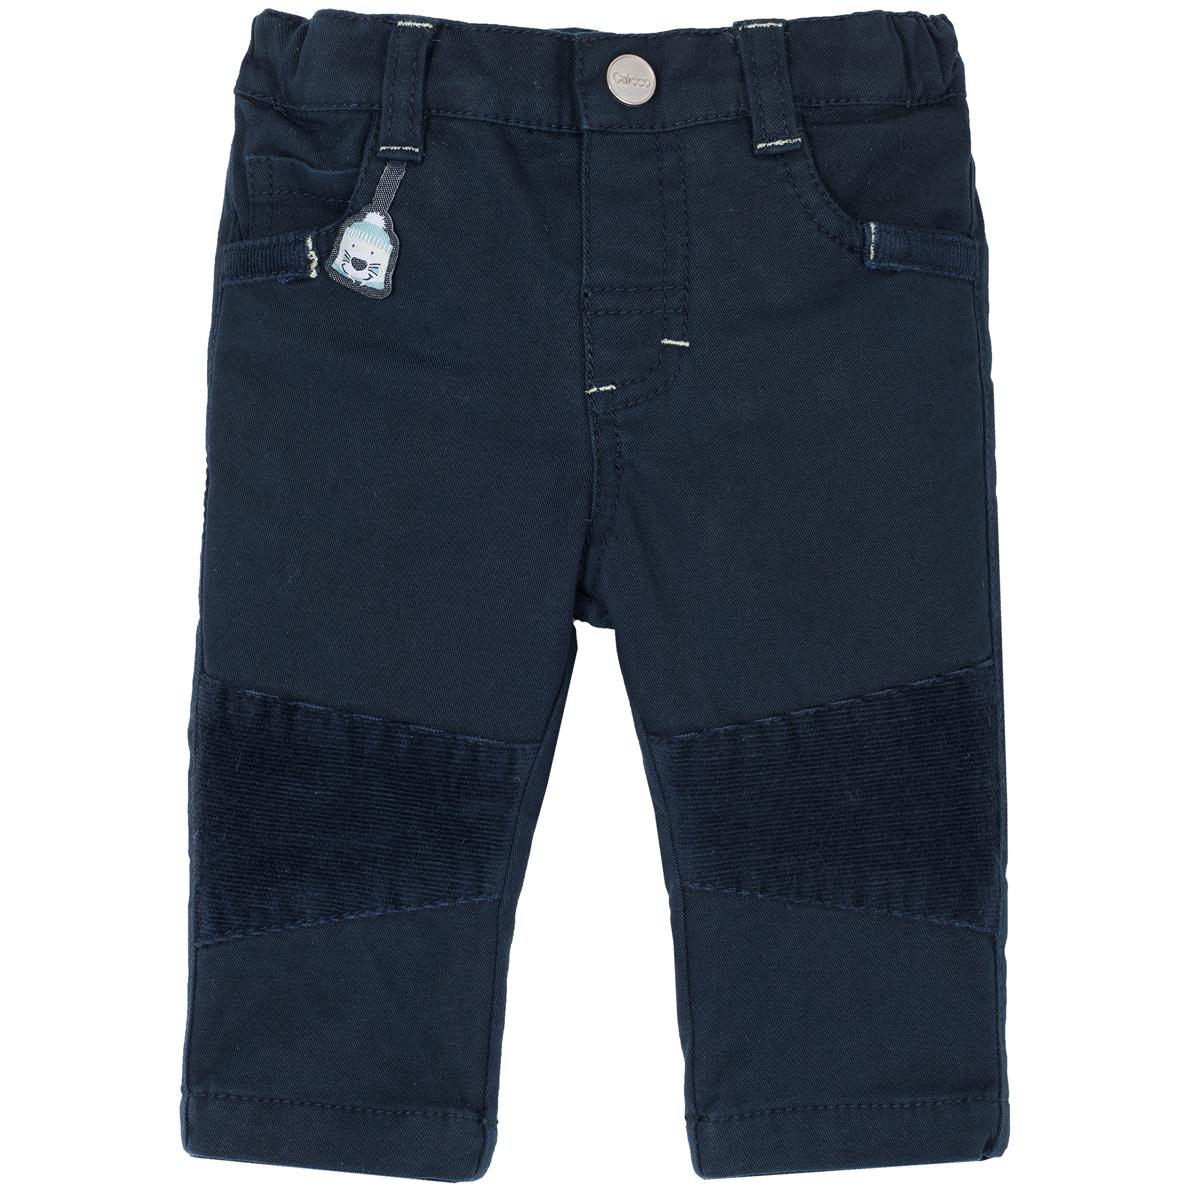 Pantaloni lungi copii Chicco, twill elastic, ursulet brodat, 08038 din categoria Pantaloni copii